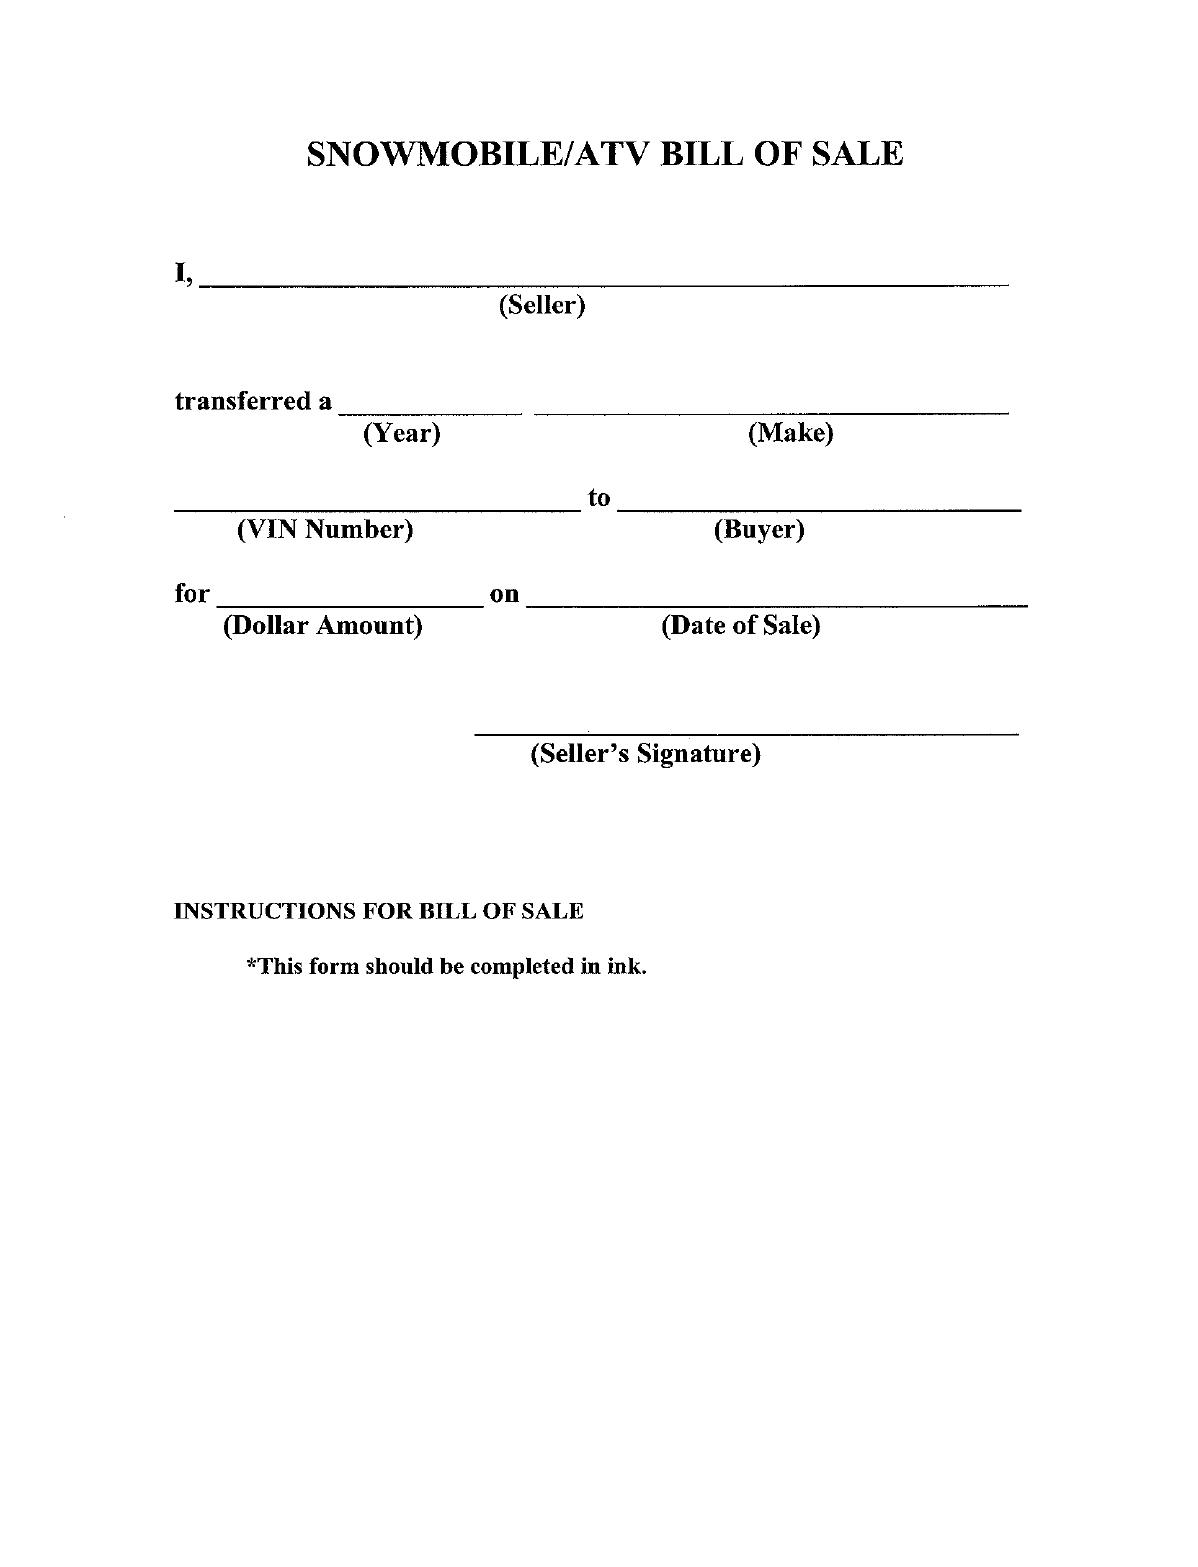 Atv Bill Of Sale Templates Word Excel Fomats